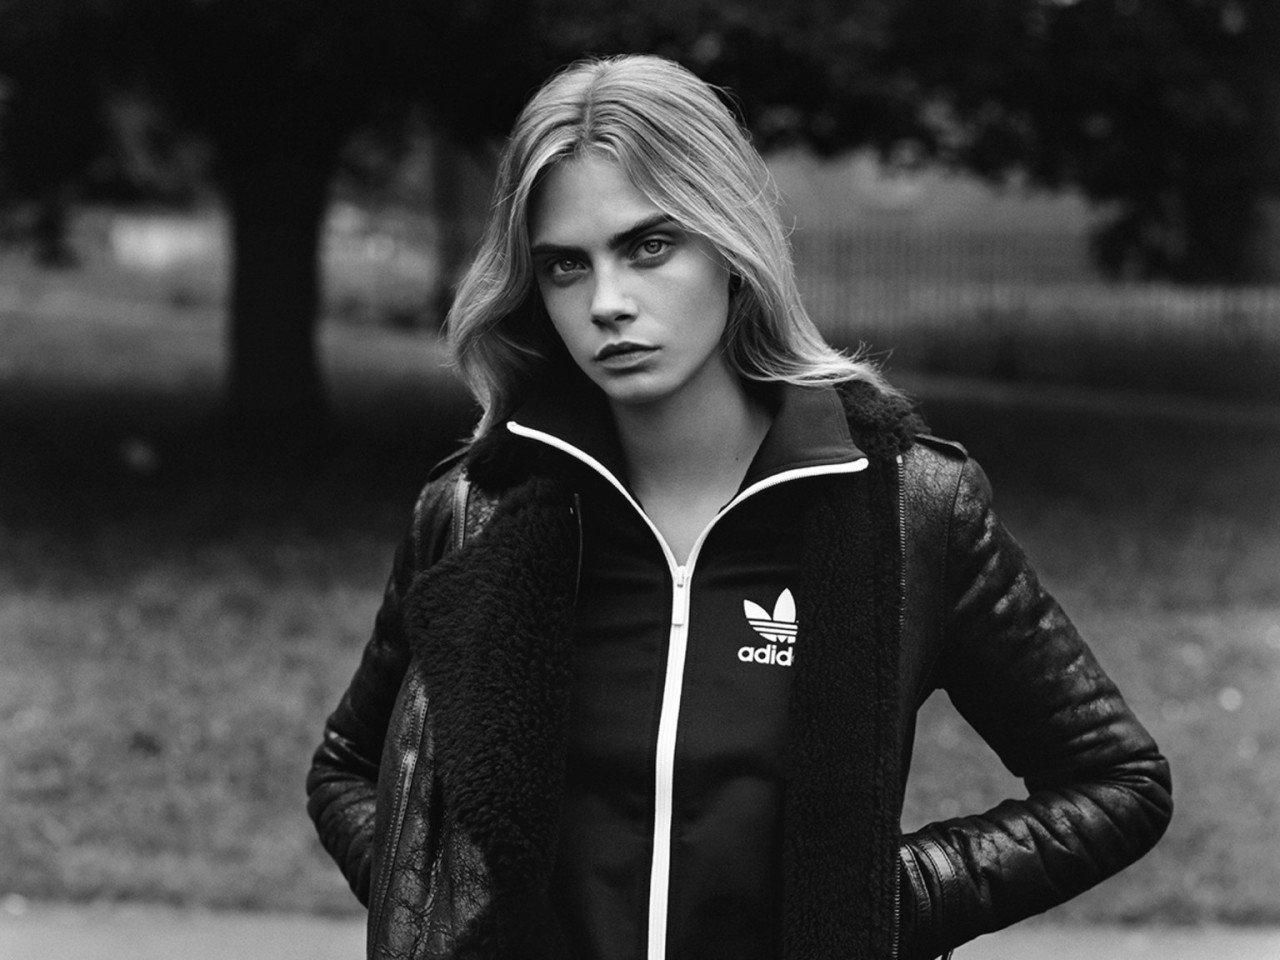 cara-delevingne-adidas.jpg ㅇㅎㅂ) 카라 델레바인.jpg+gif